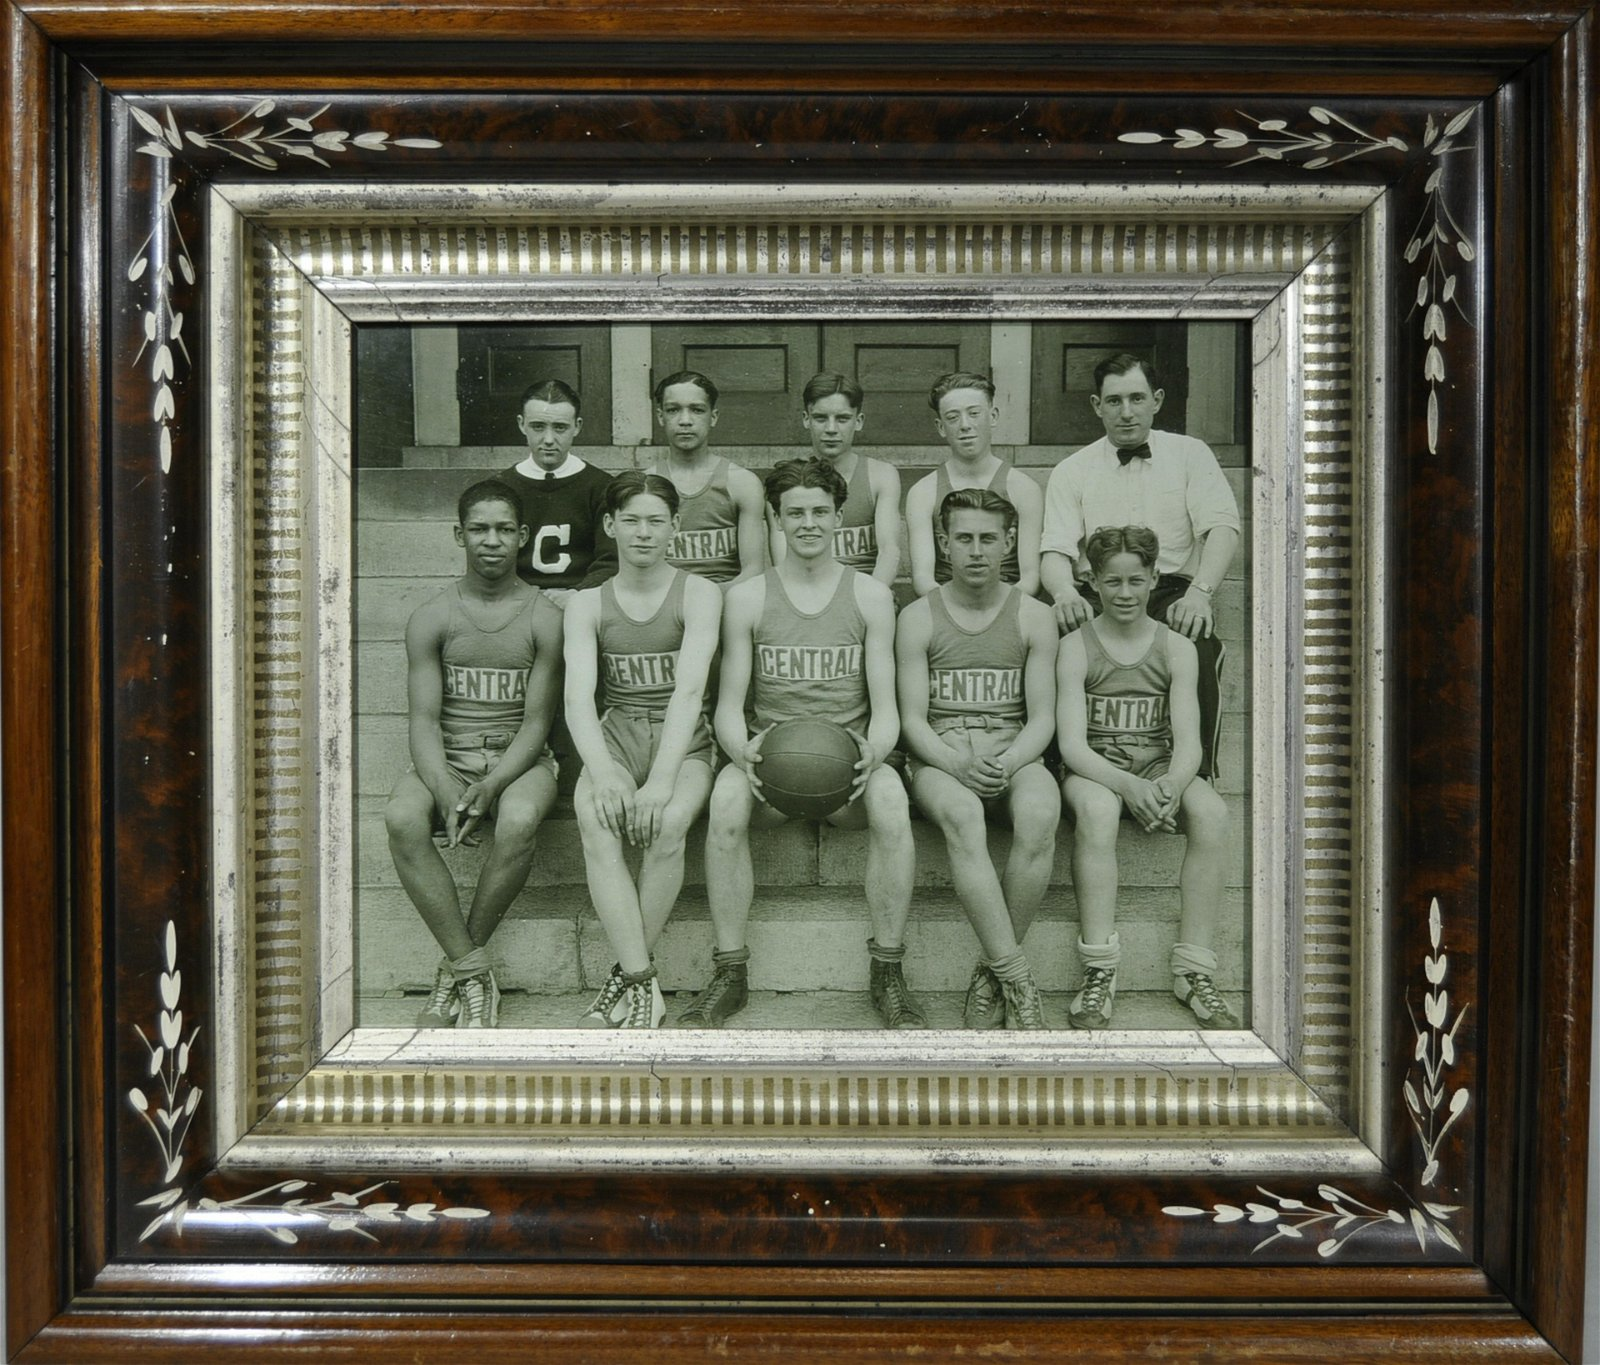 Framed Sporting Photograph